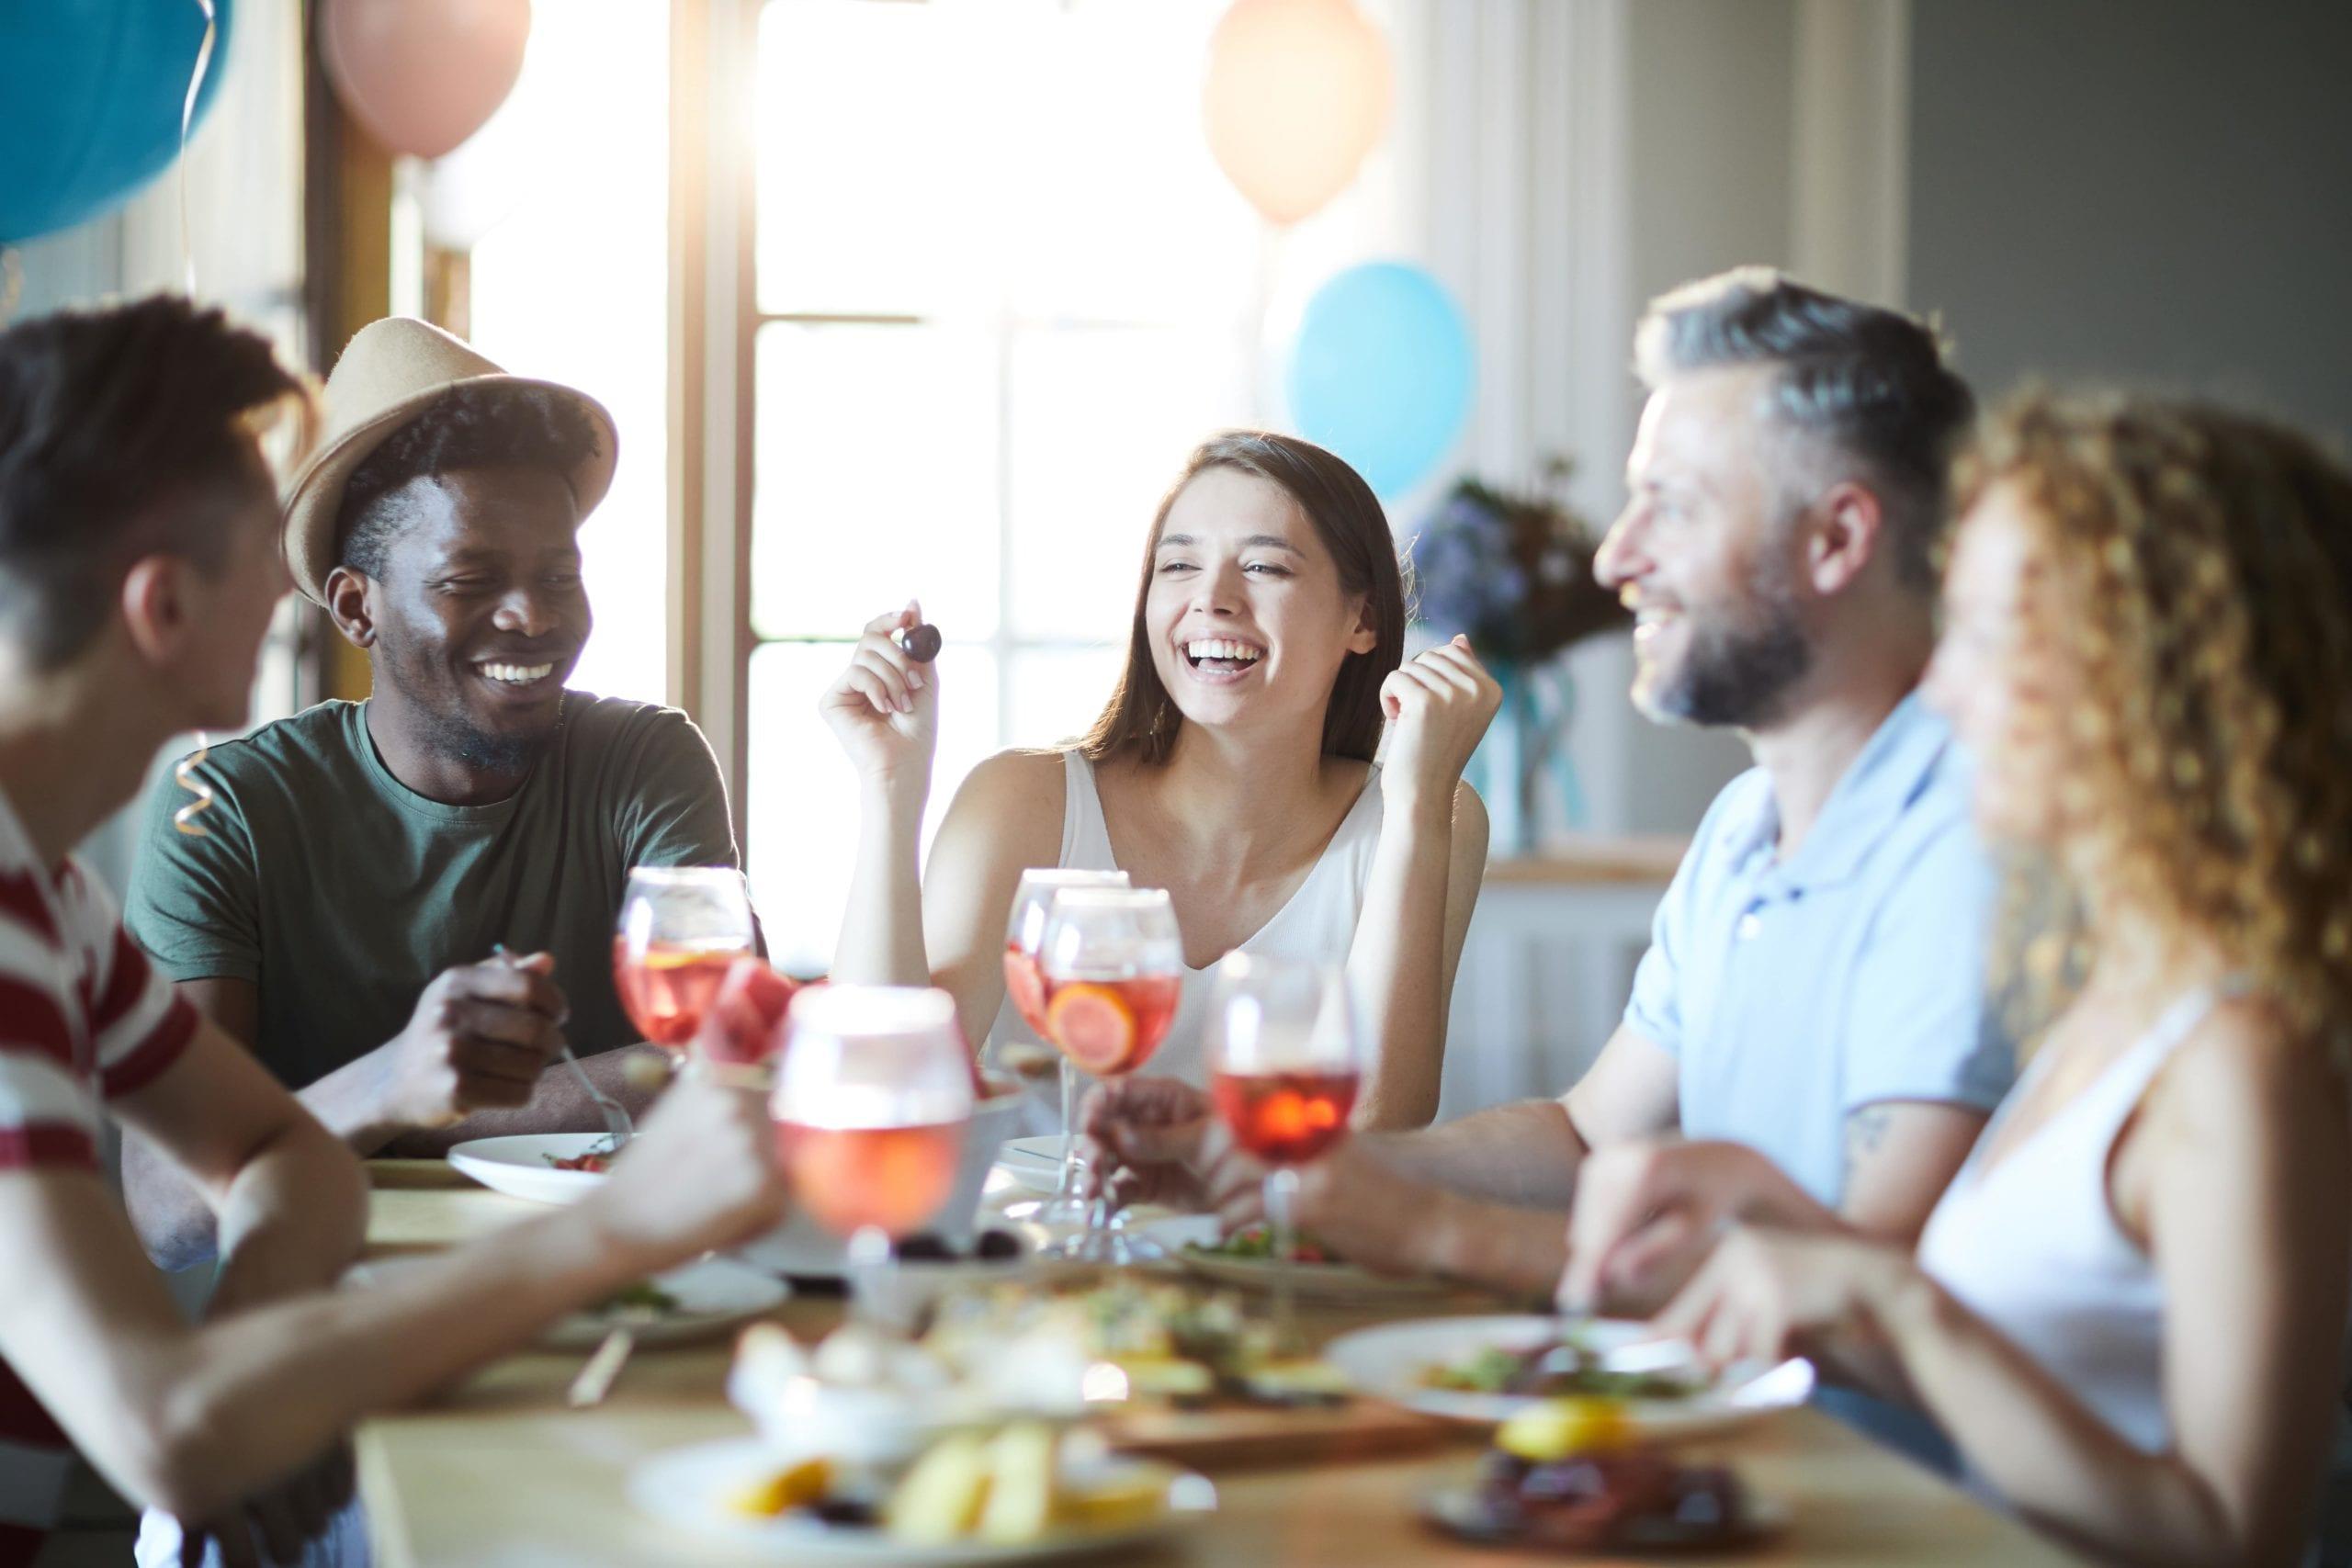 Group of friends celebrating National CBD Day over dinner